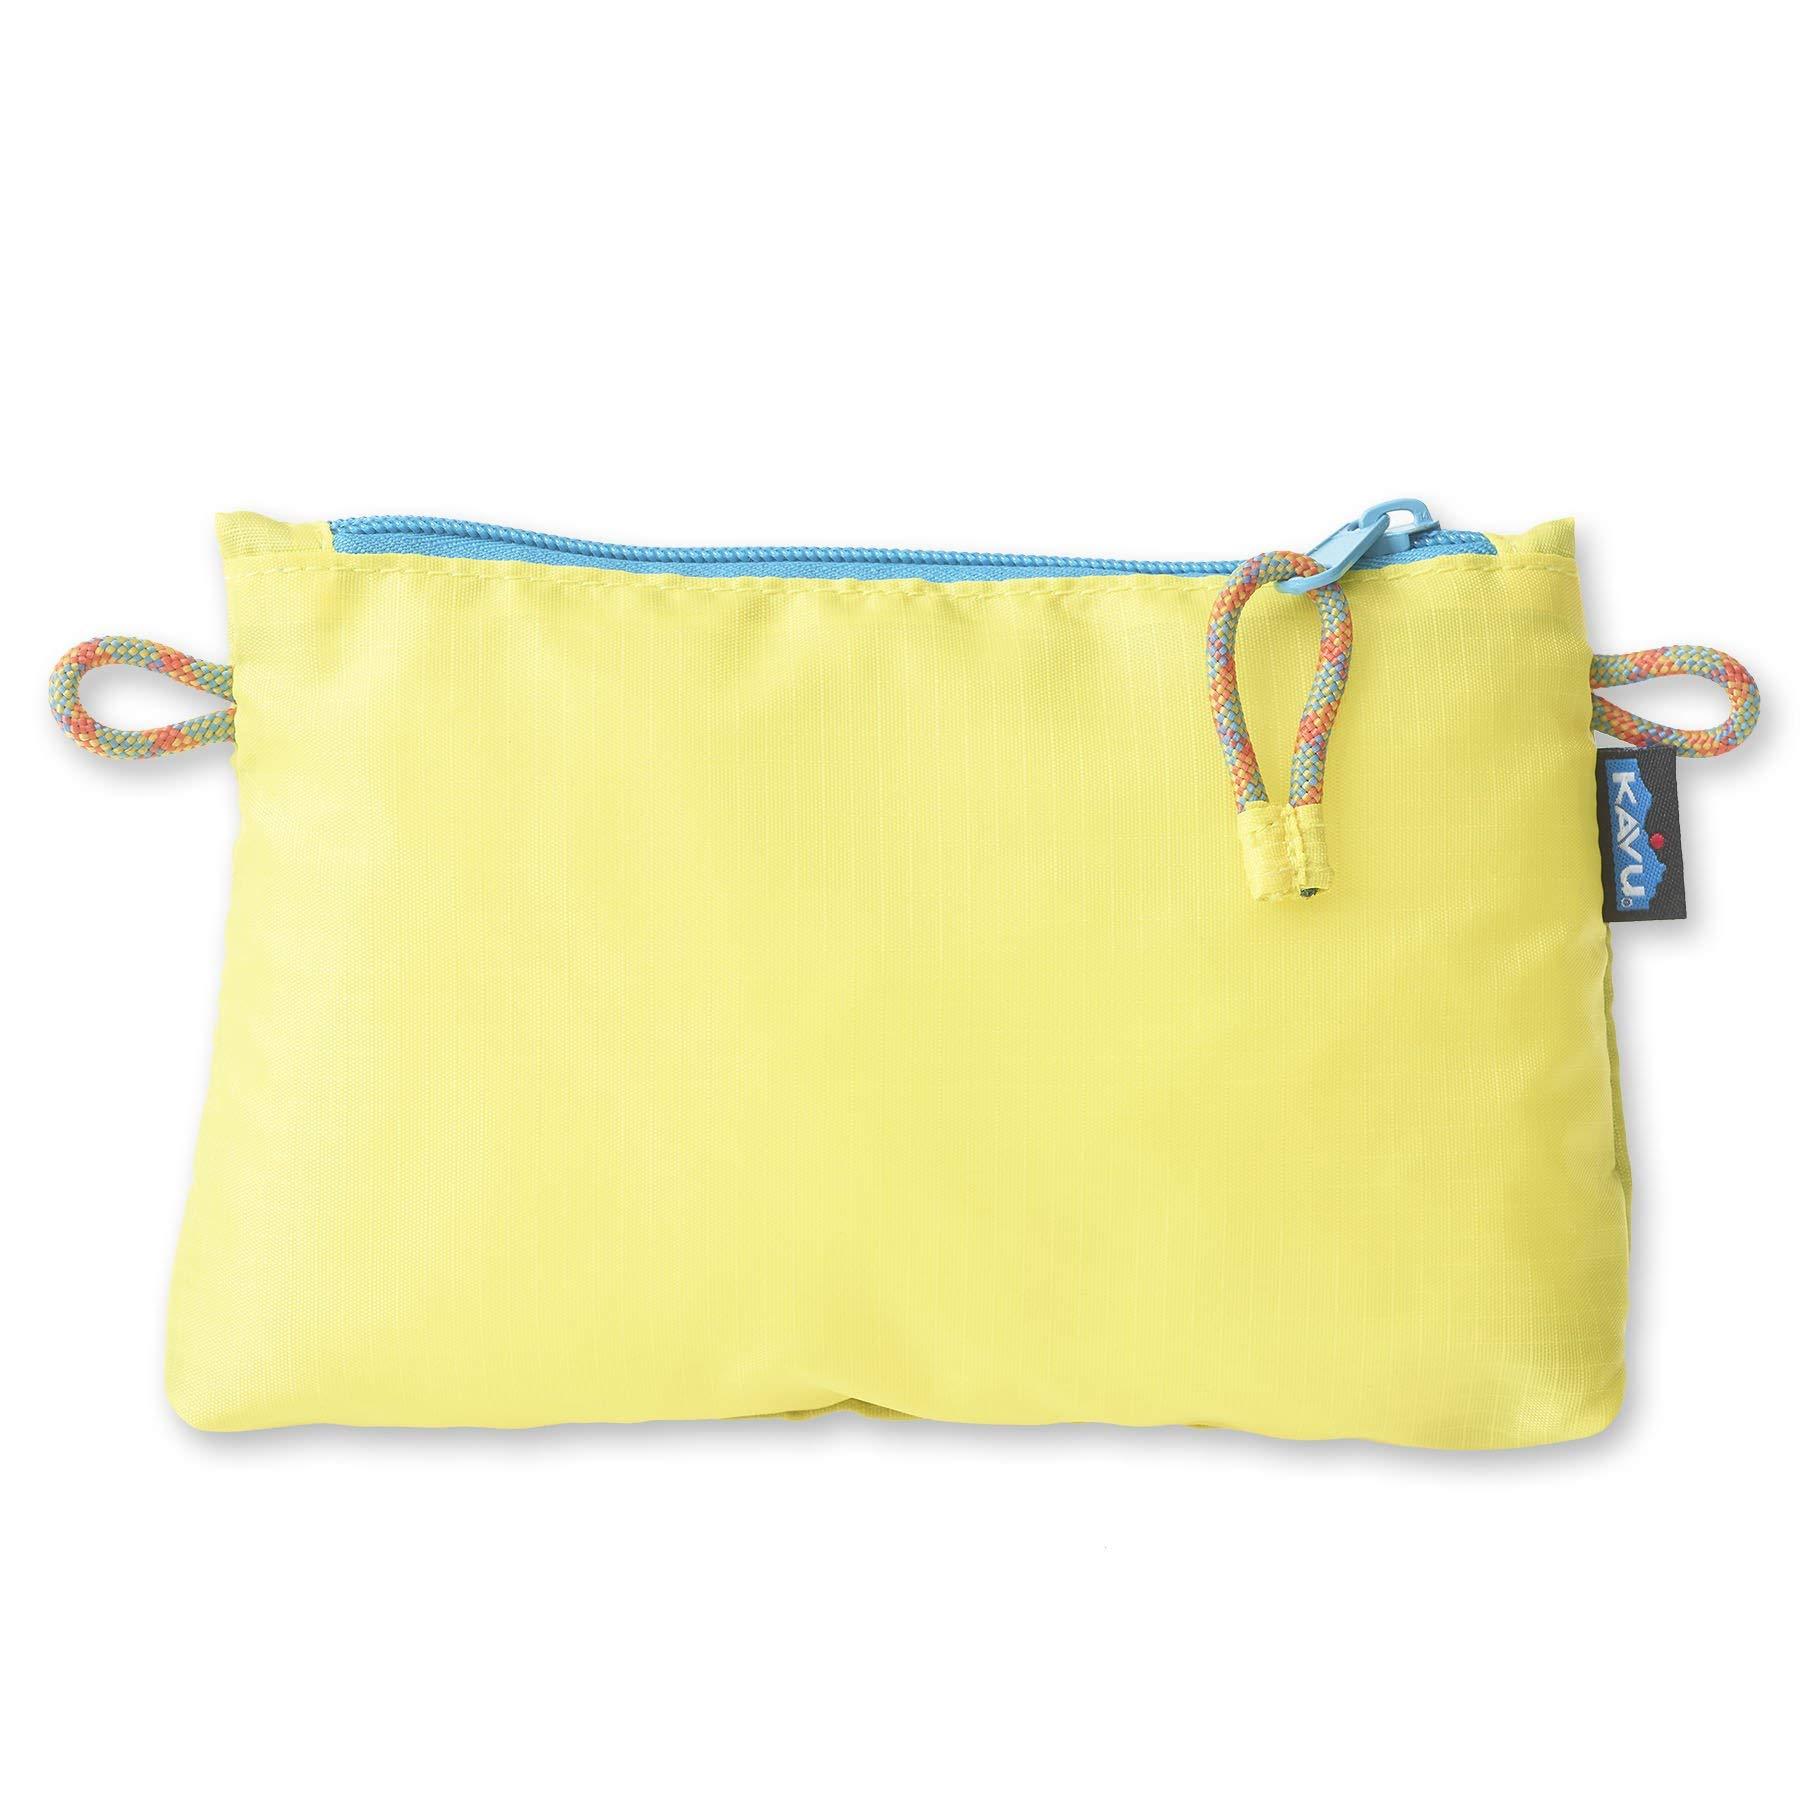 KAVU Ragged Ridge Zip Accessory Pouch Water Resistant Travel Bag - Banana Split